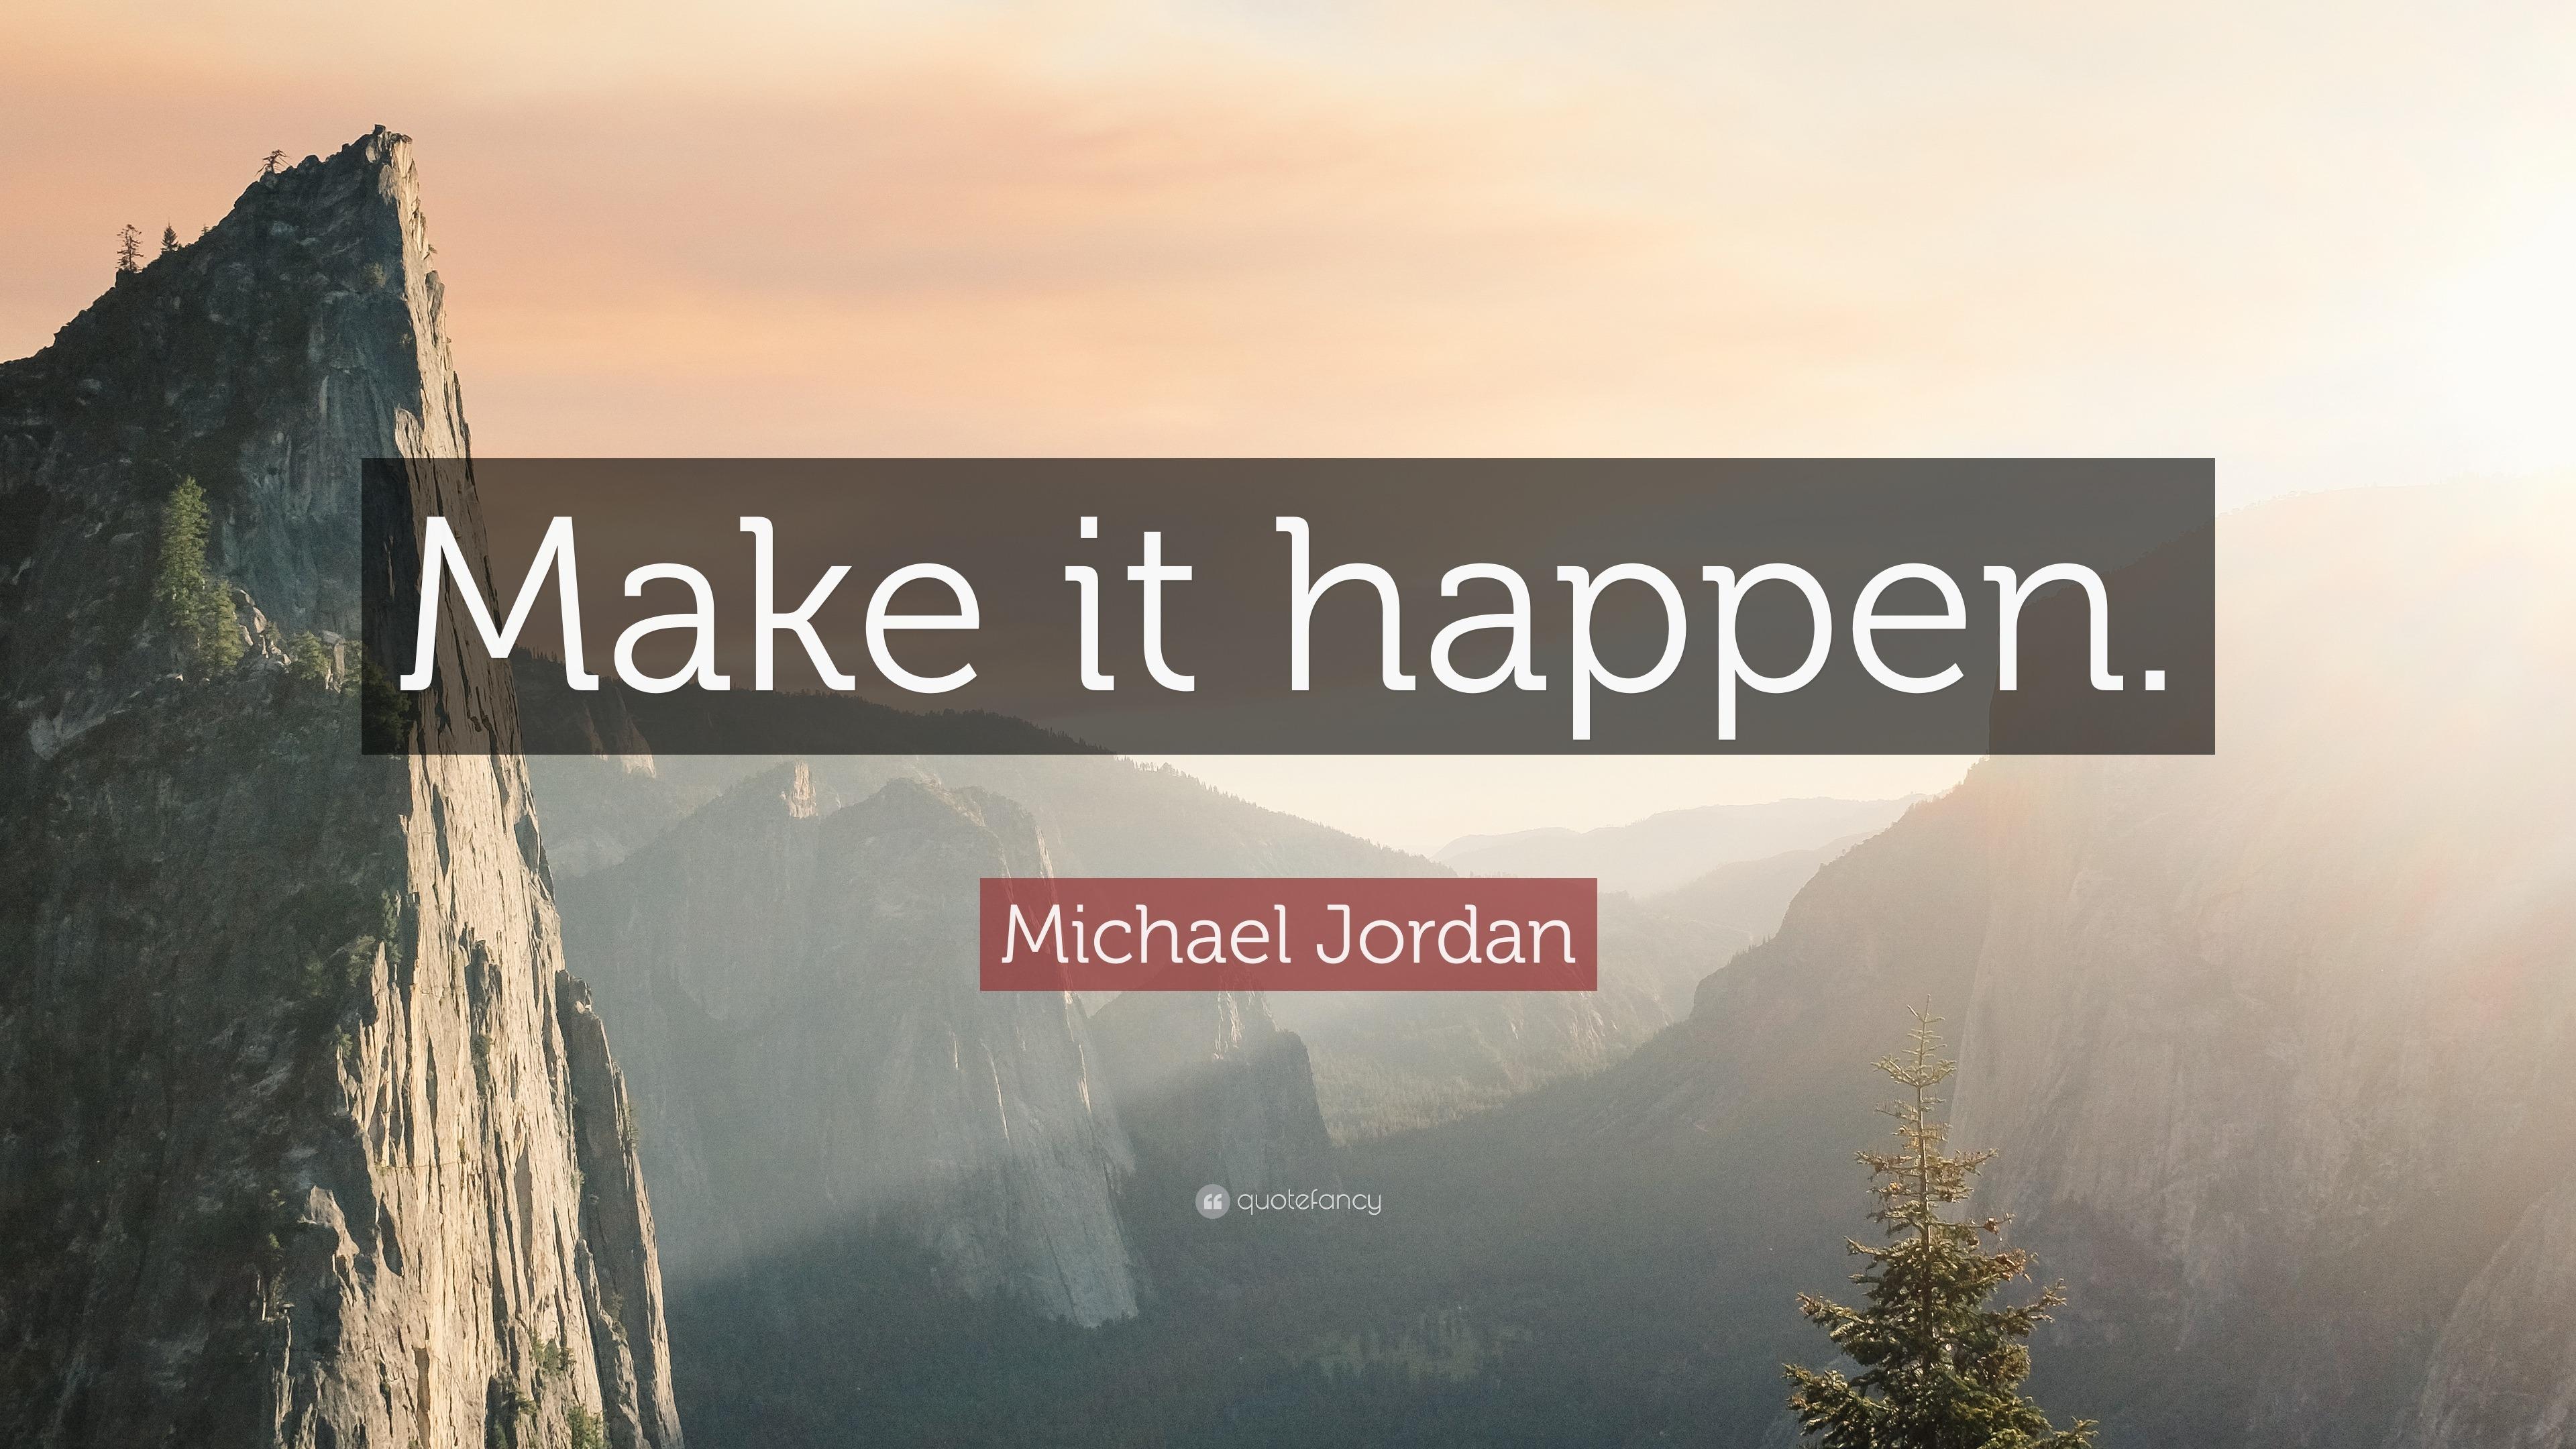 Positive Attitude Quotes Wallpapers Michael Jordan Quote Make It Happen 31 Wallpapers